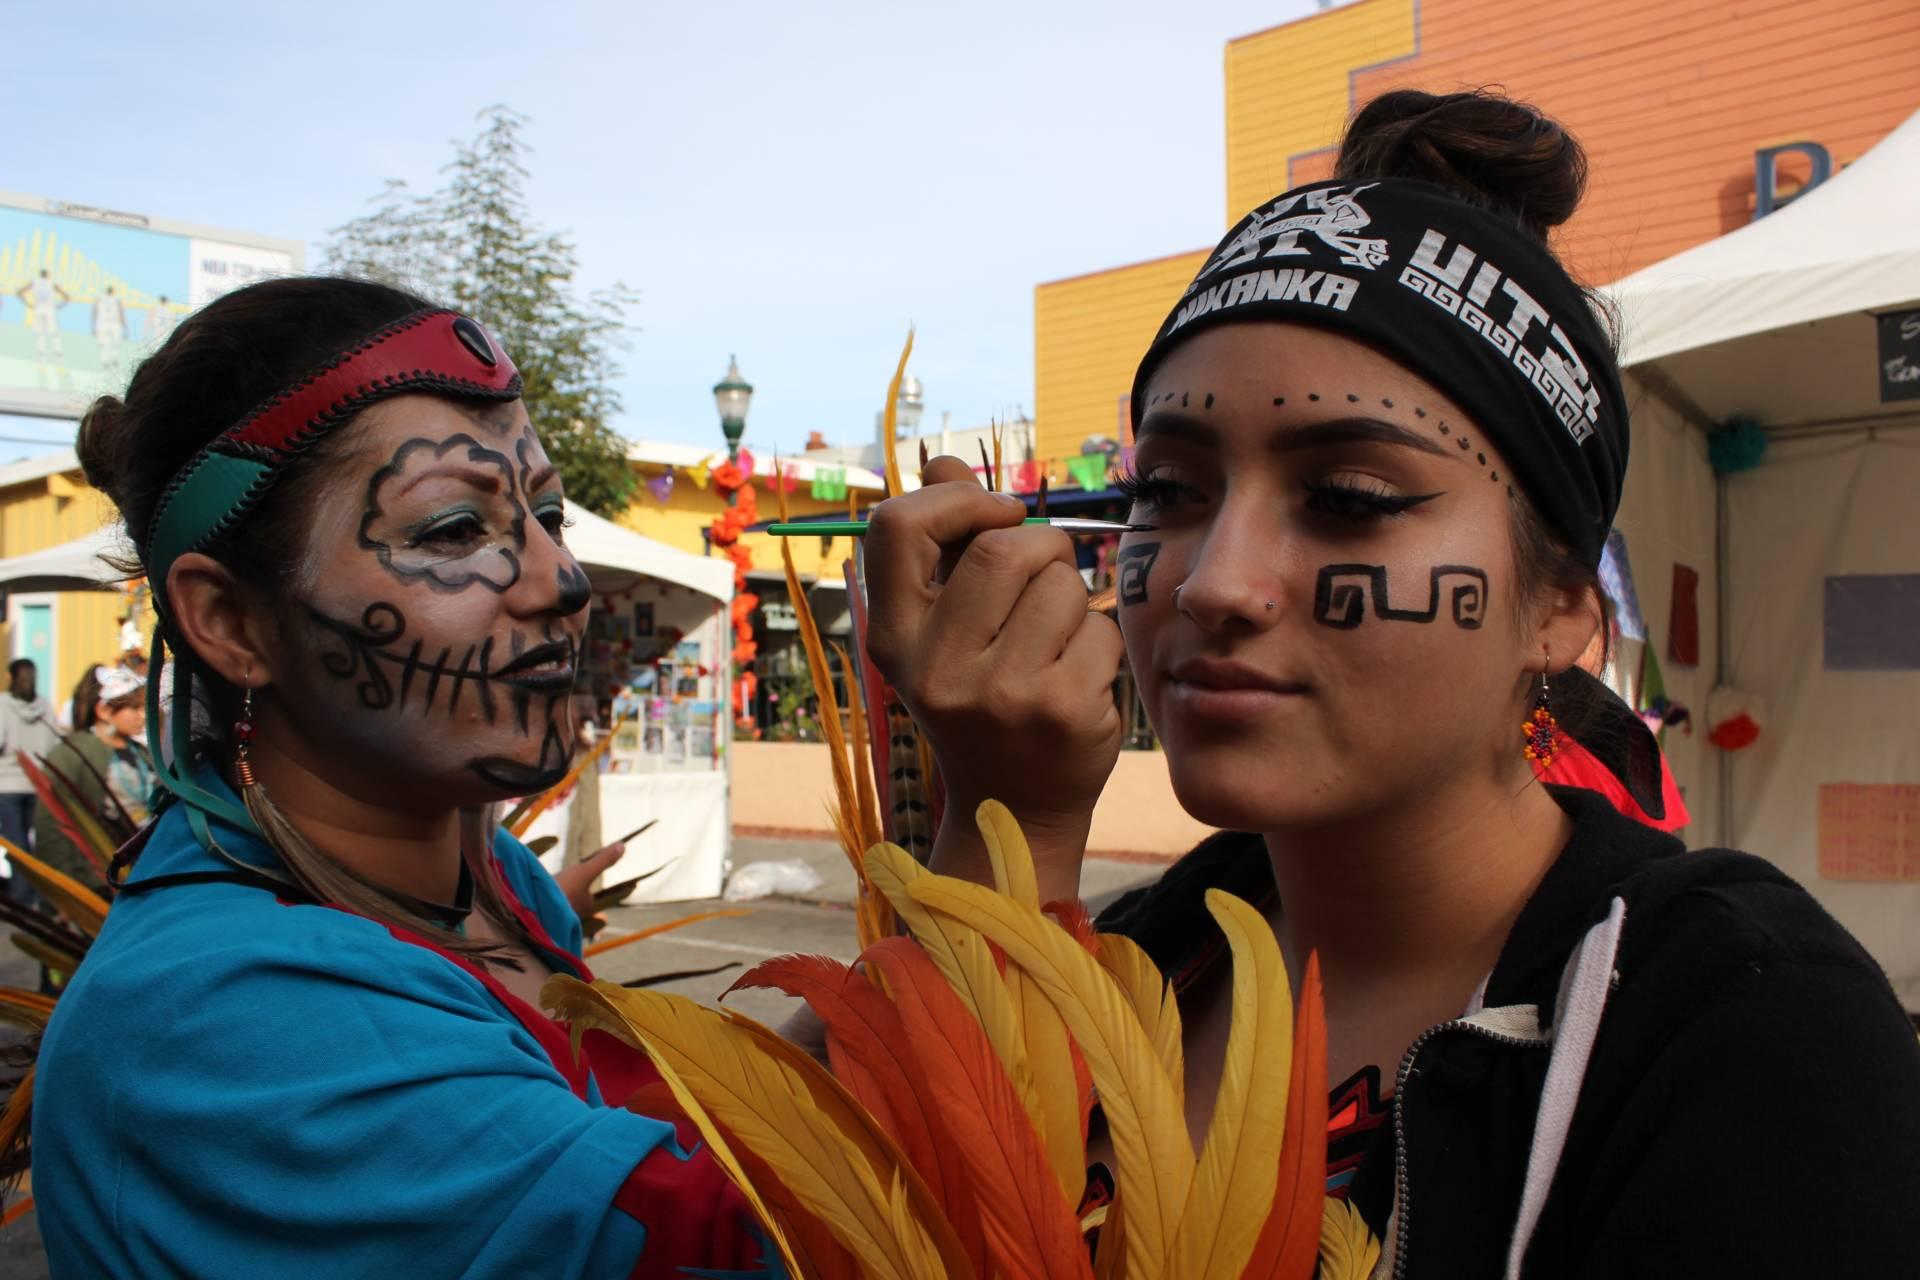 Maricela Sandoval of San Jose paints the face of fellow dancer, Estrella Zamudio, also of San Jose. Sara Hossaini/KQED